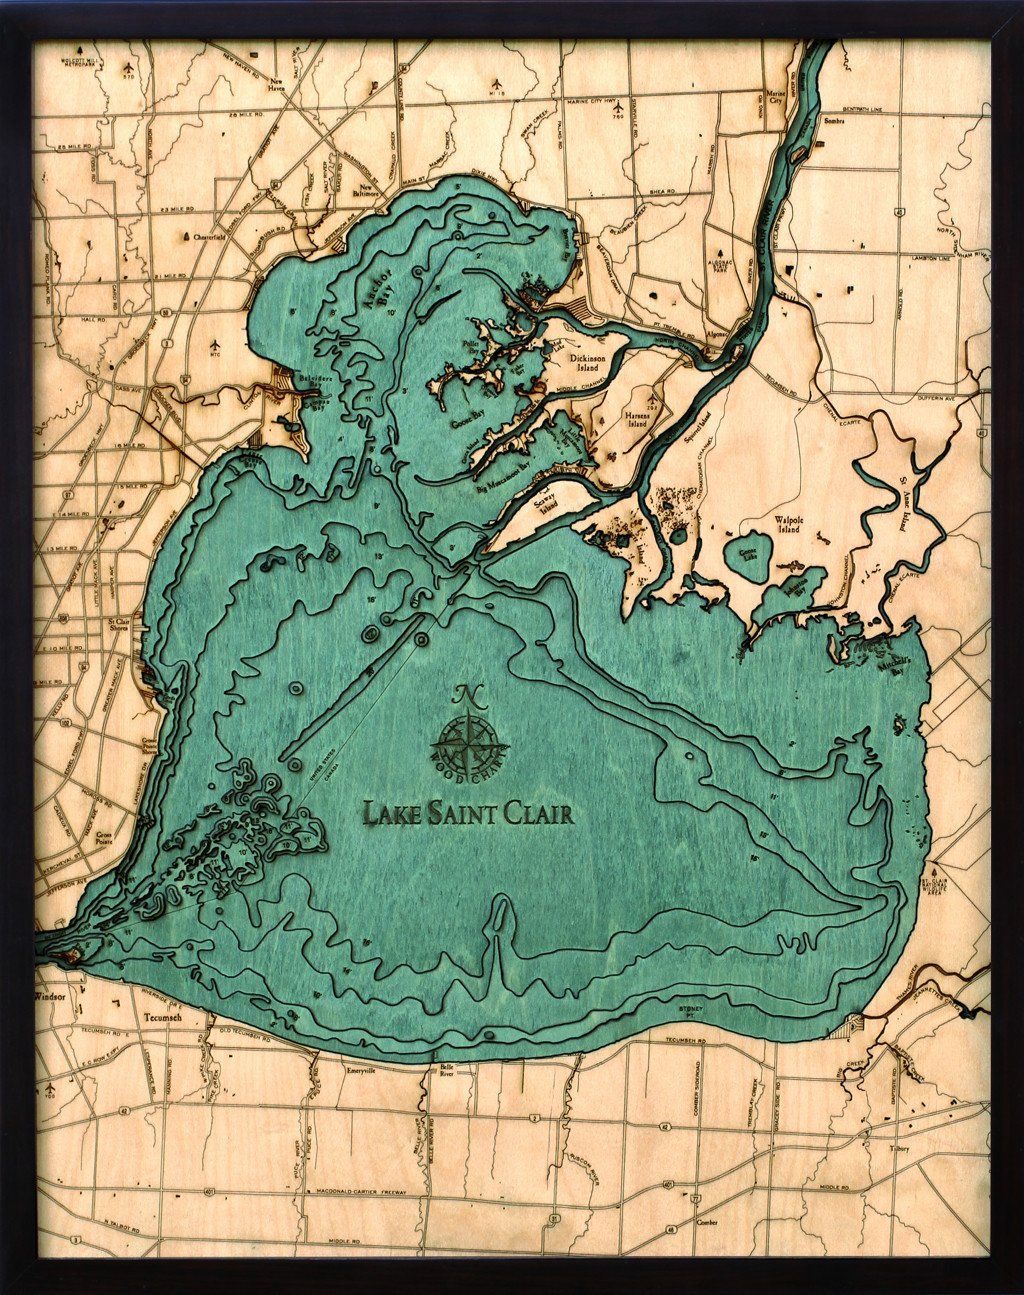 A nautical wood map featuring Lake Saint